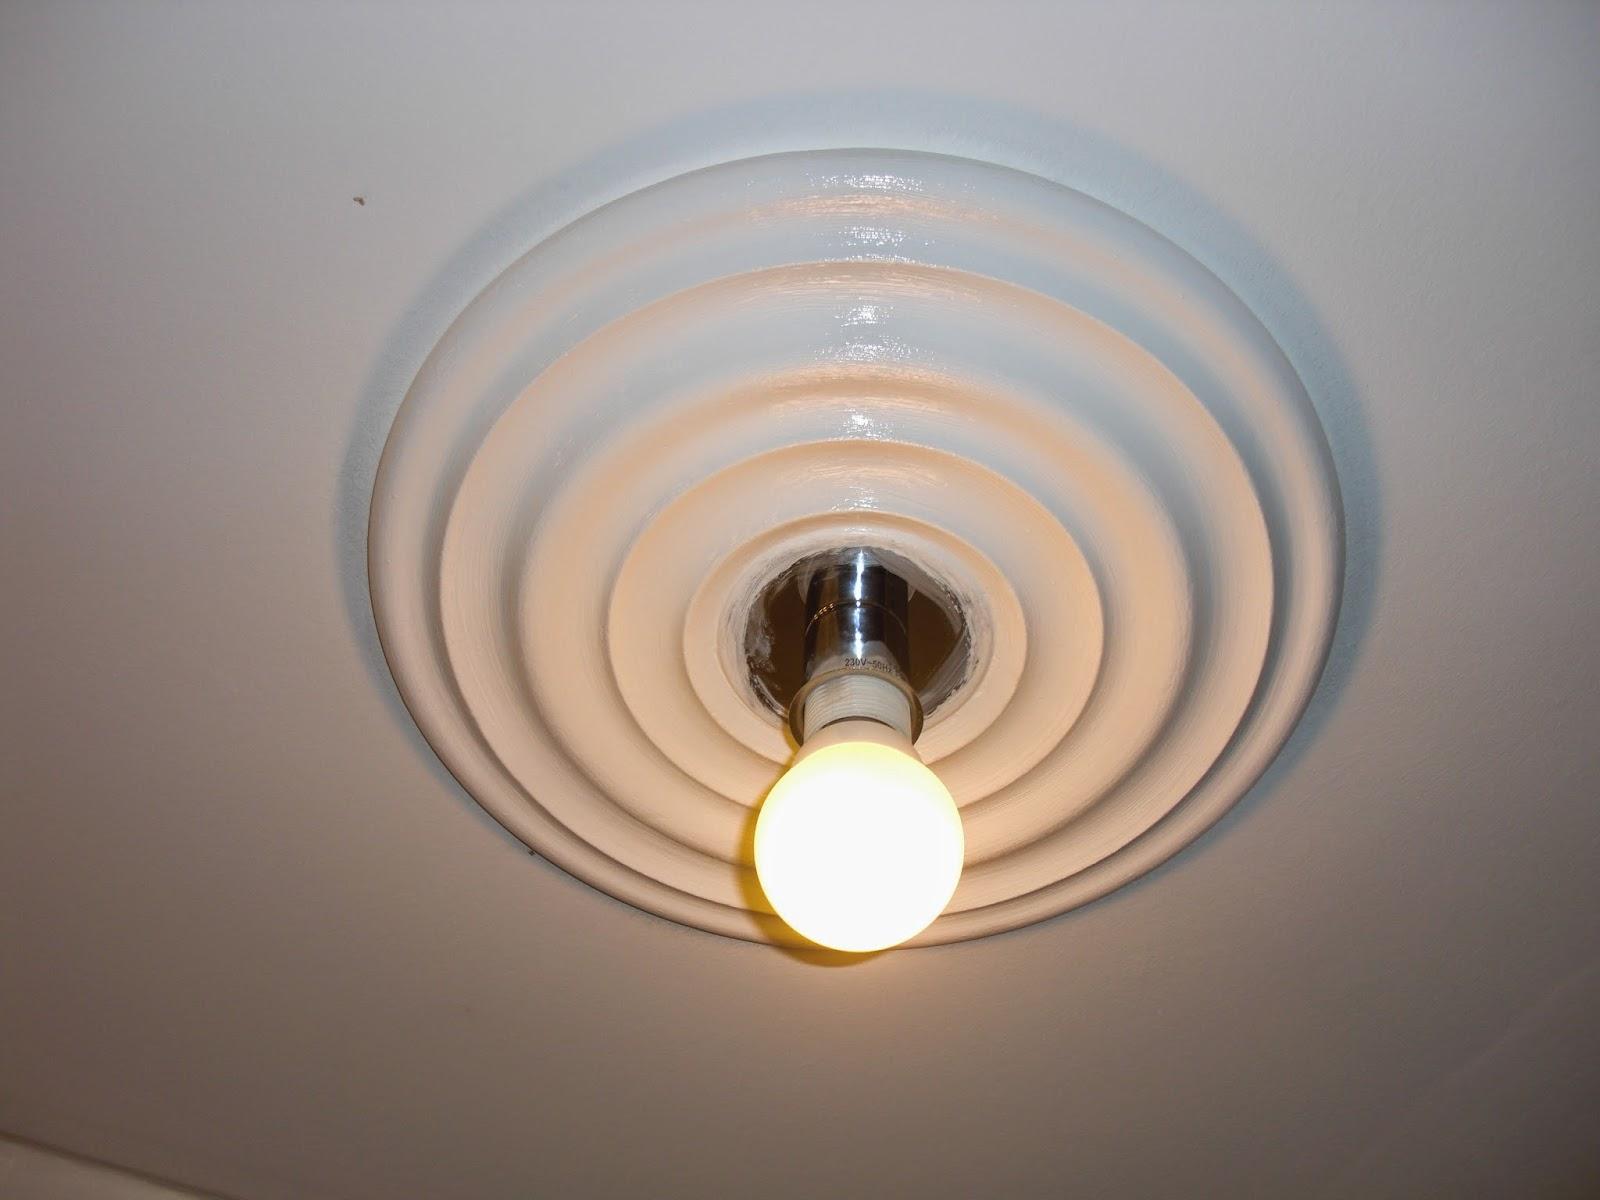 Stuck Rosette Für Lampen stuckrosette styropor lampe: stuckrosetten styropor rosetten für